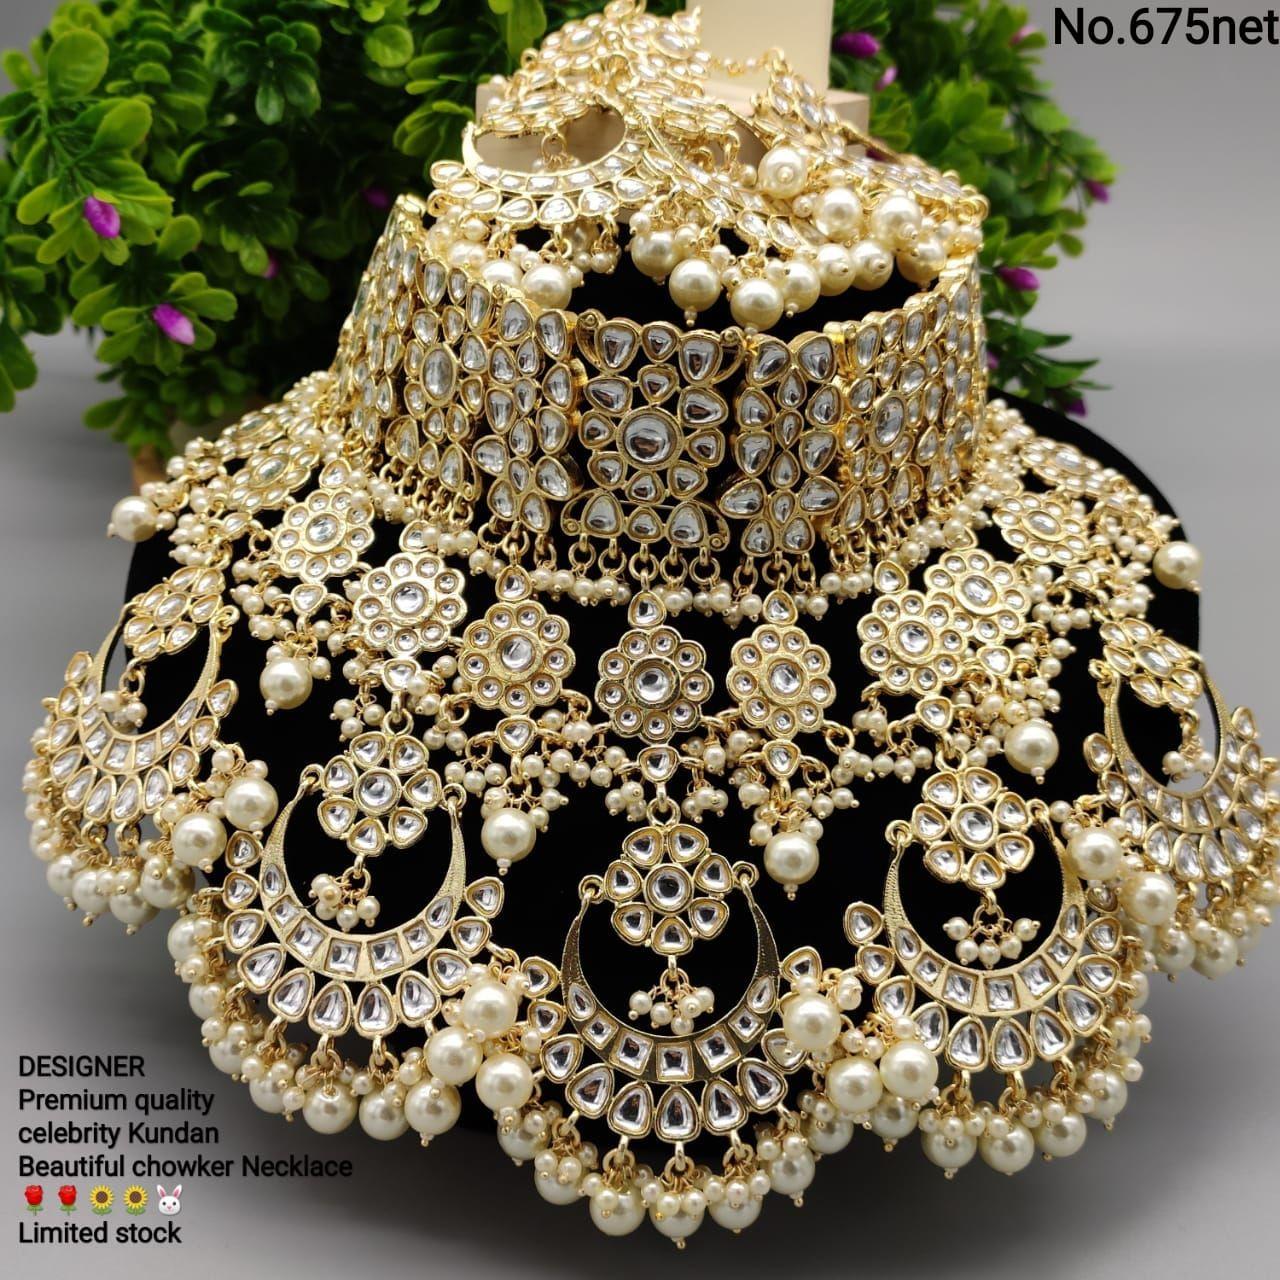 Order Choker Necklace Set SHREEART @Rs 1755+$  via